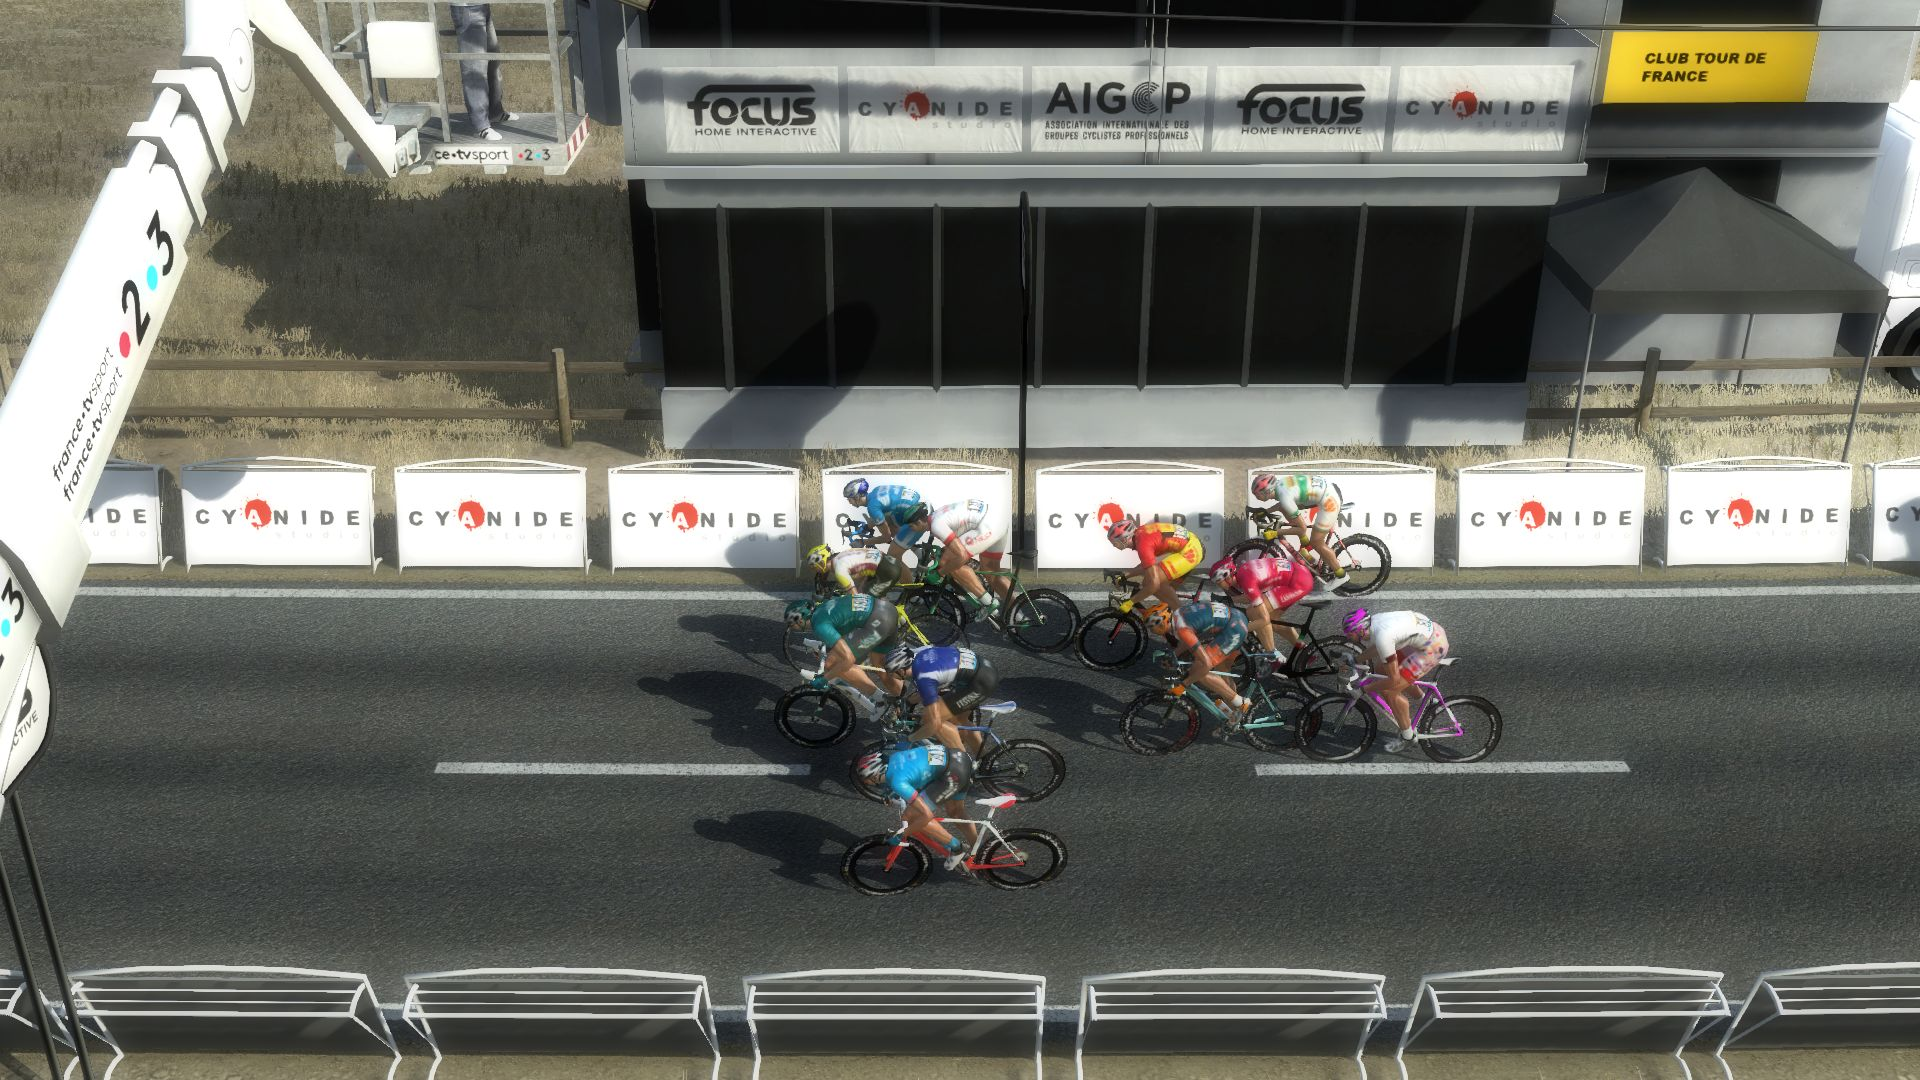 pcmdaily.com/images/mg/2019/Races/PT/Qatar/mg19_qat_s03_14.jpg